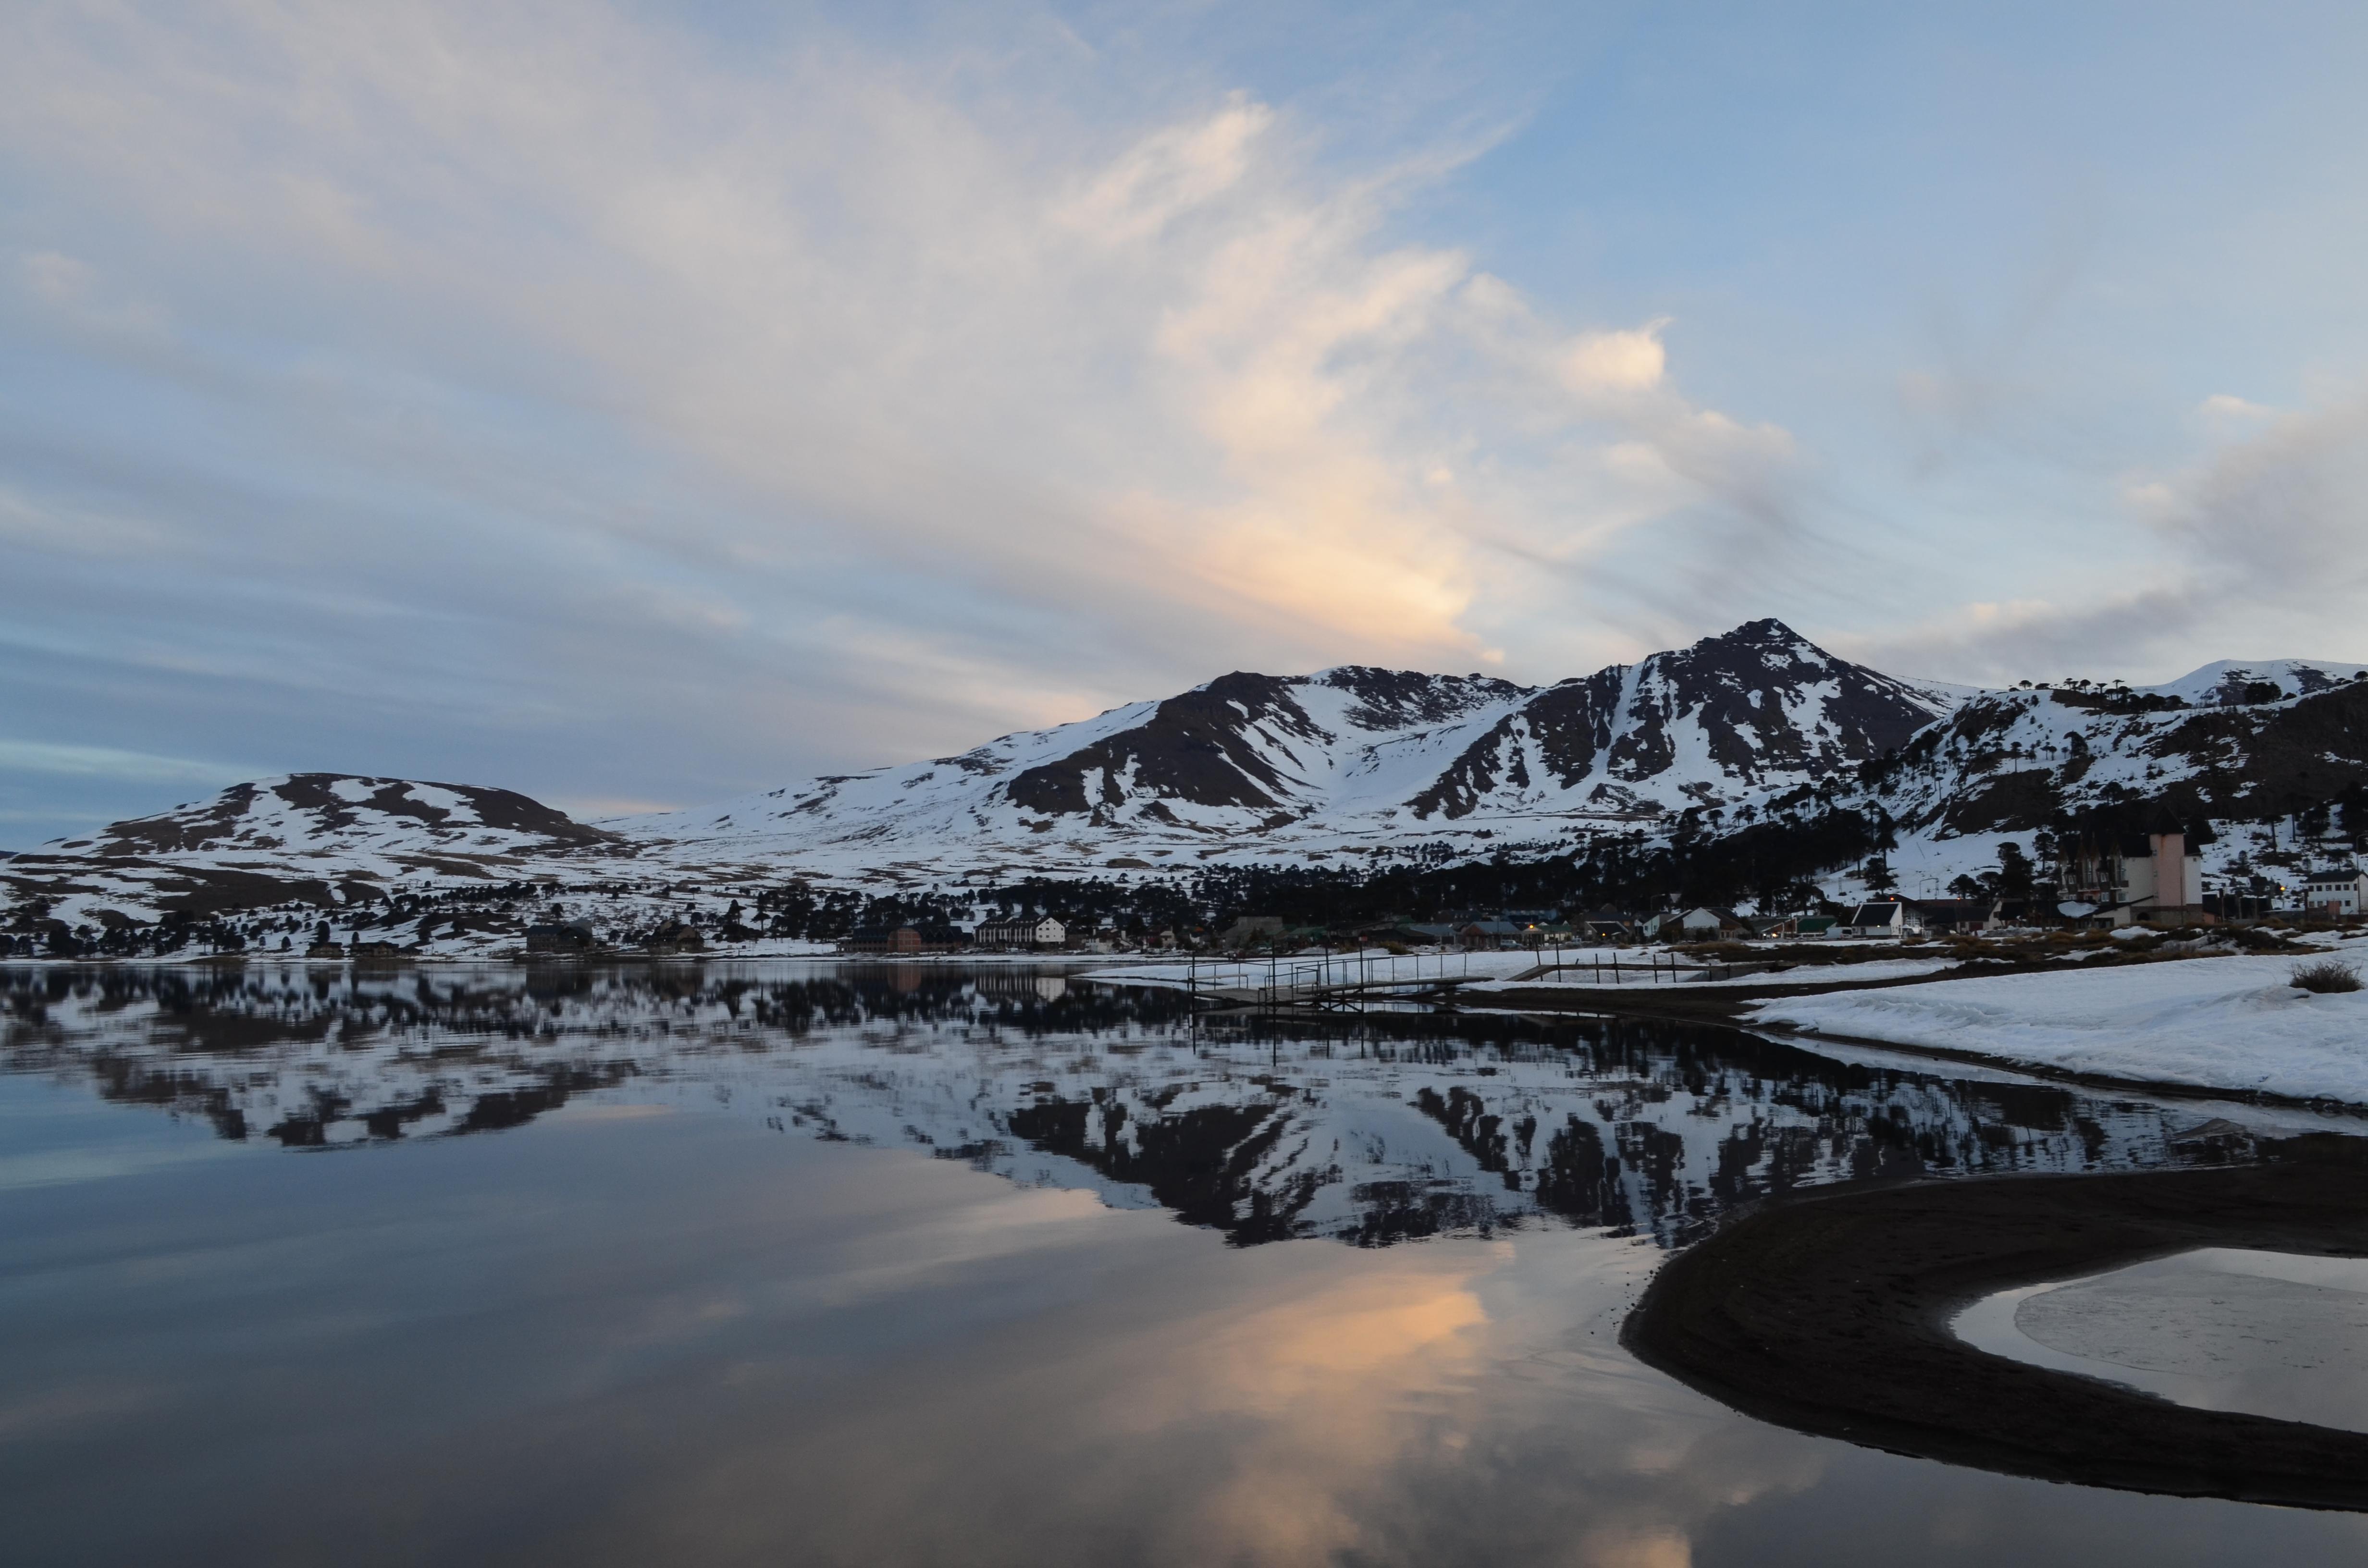 lago caviahue